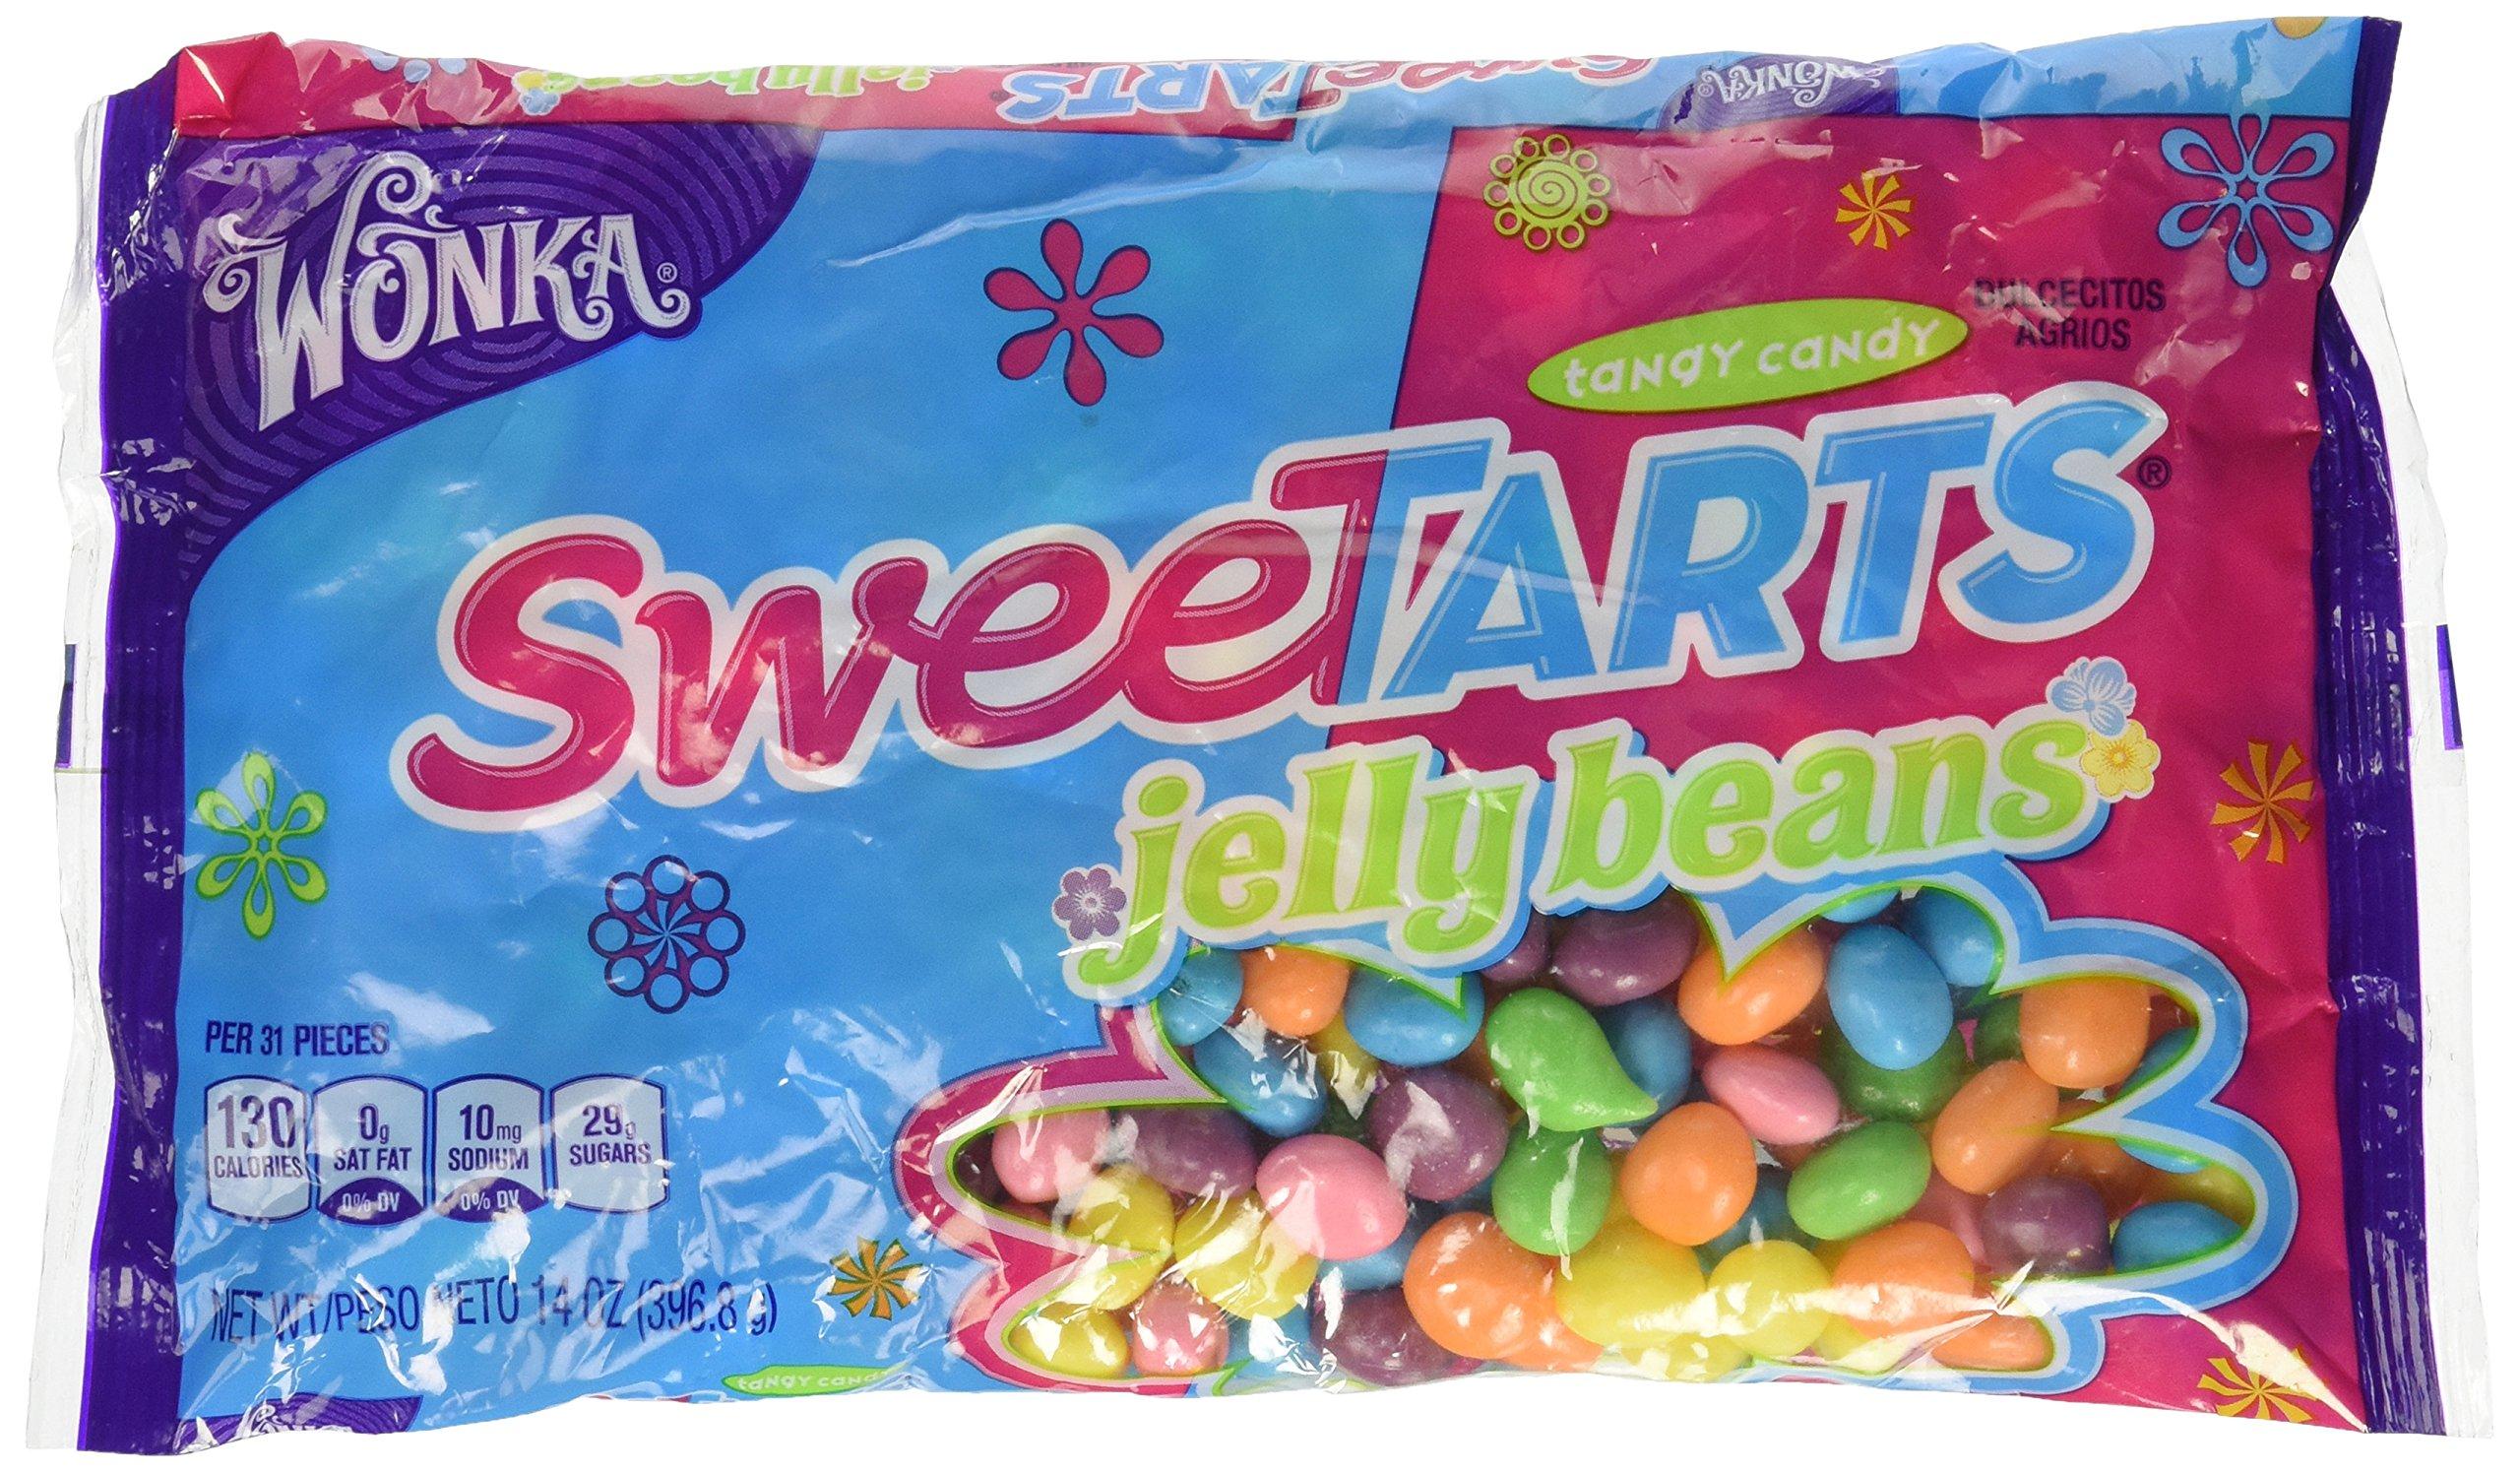 Amazon.com : Jolly Rancher Jelly Beans, 14-Ounce Bag (Pack